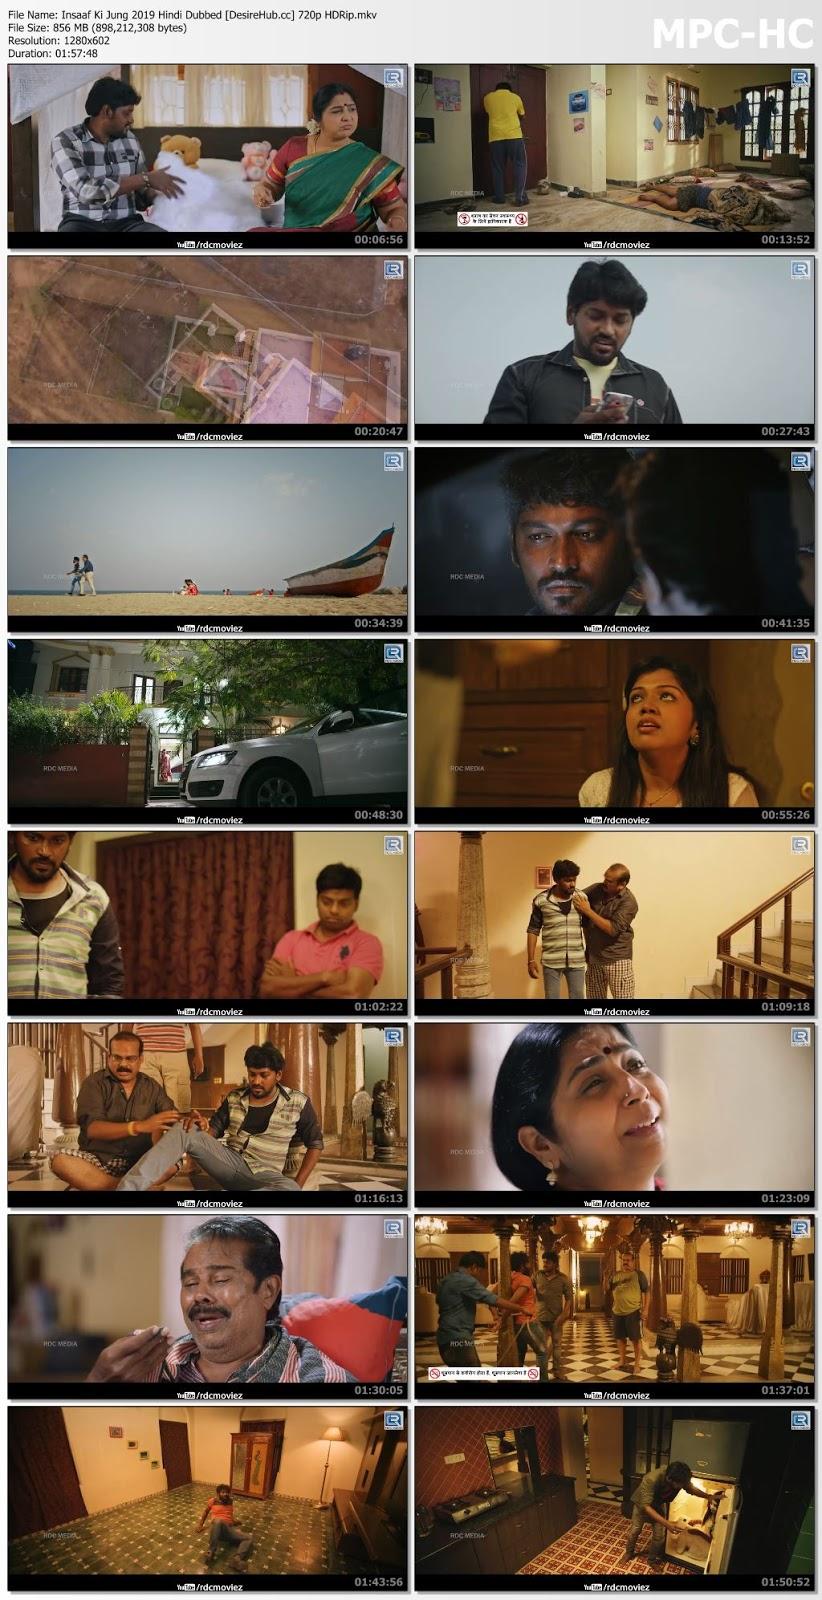 Insaaf Ki Jung 2019 Hindi Dubbed 720p HDRip 850mb Desirehub